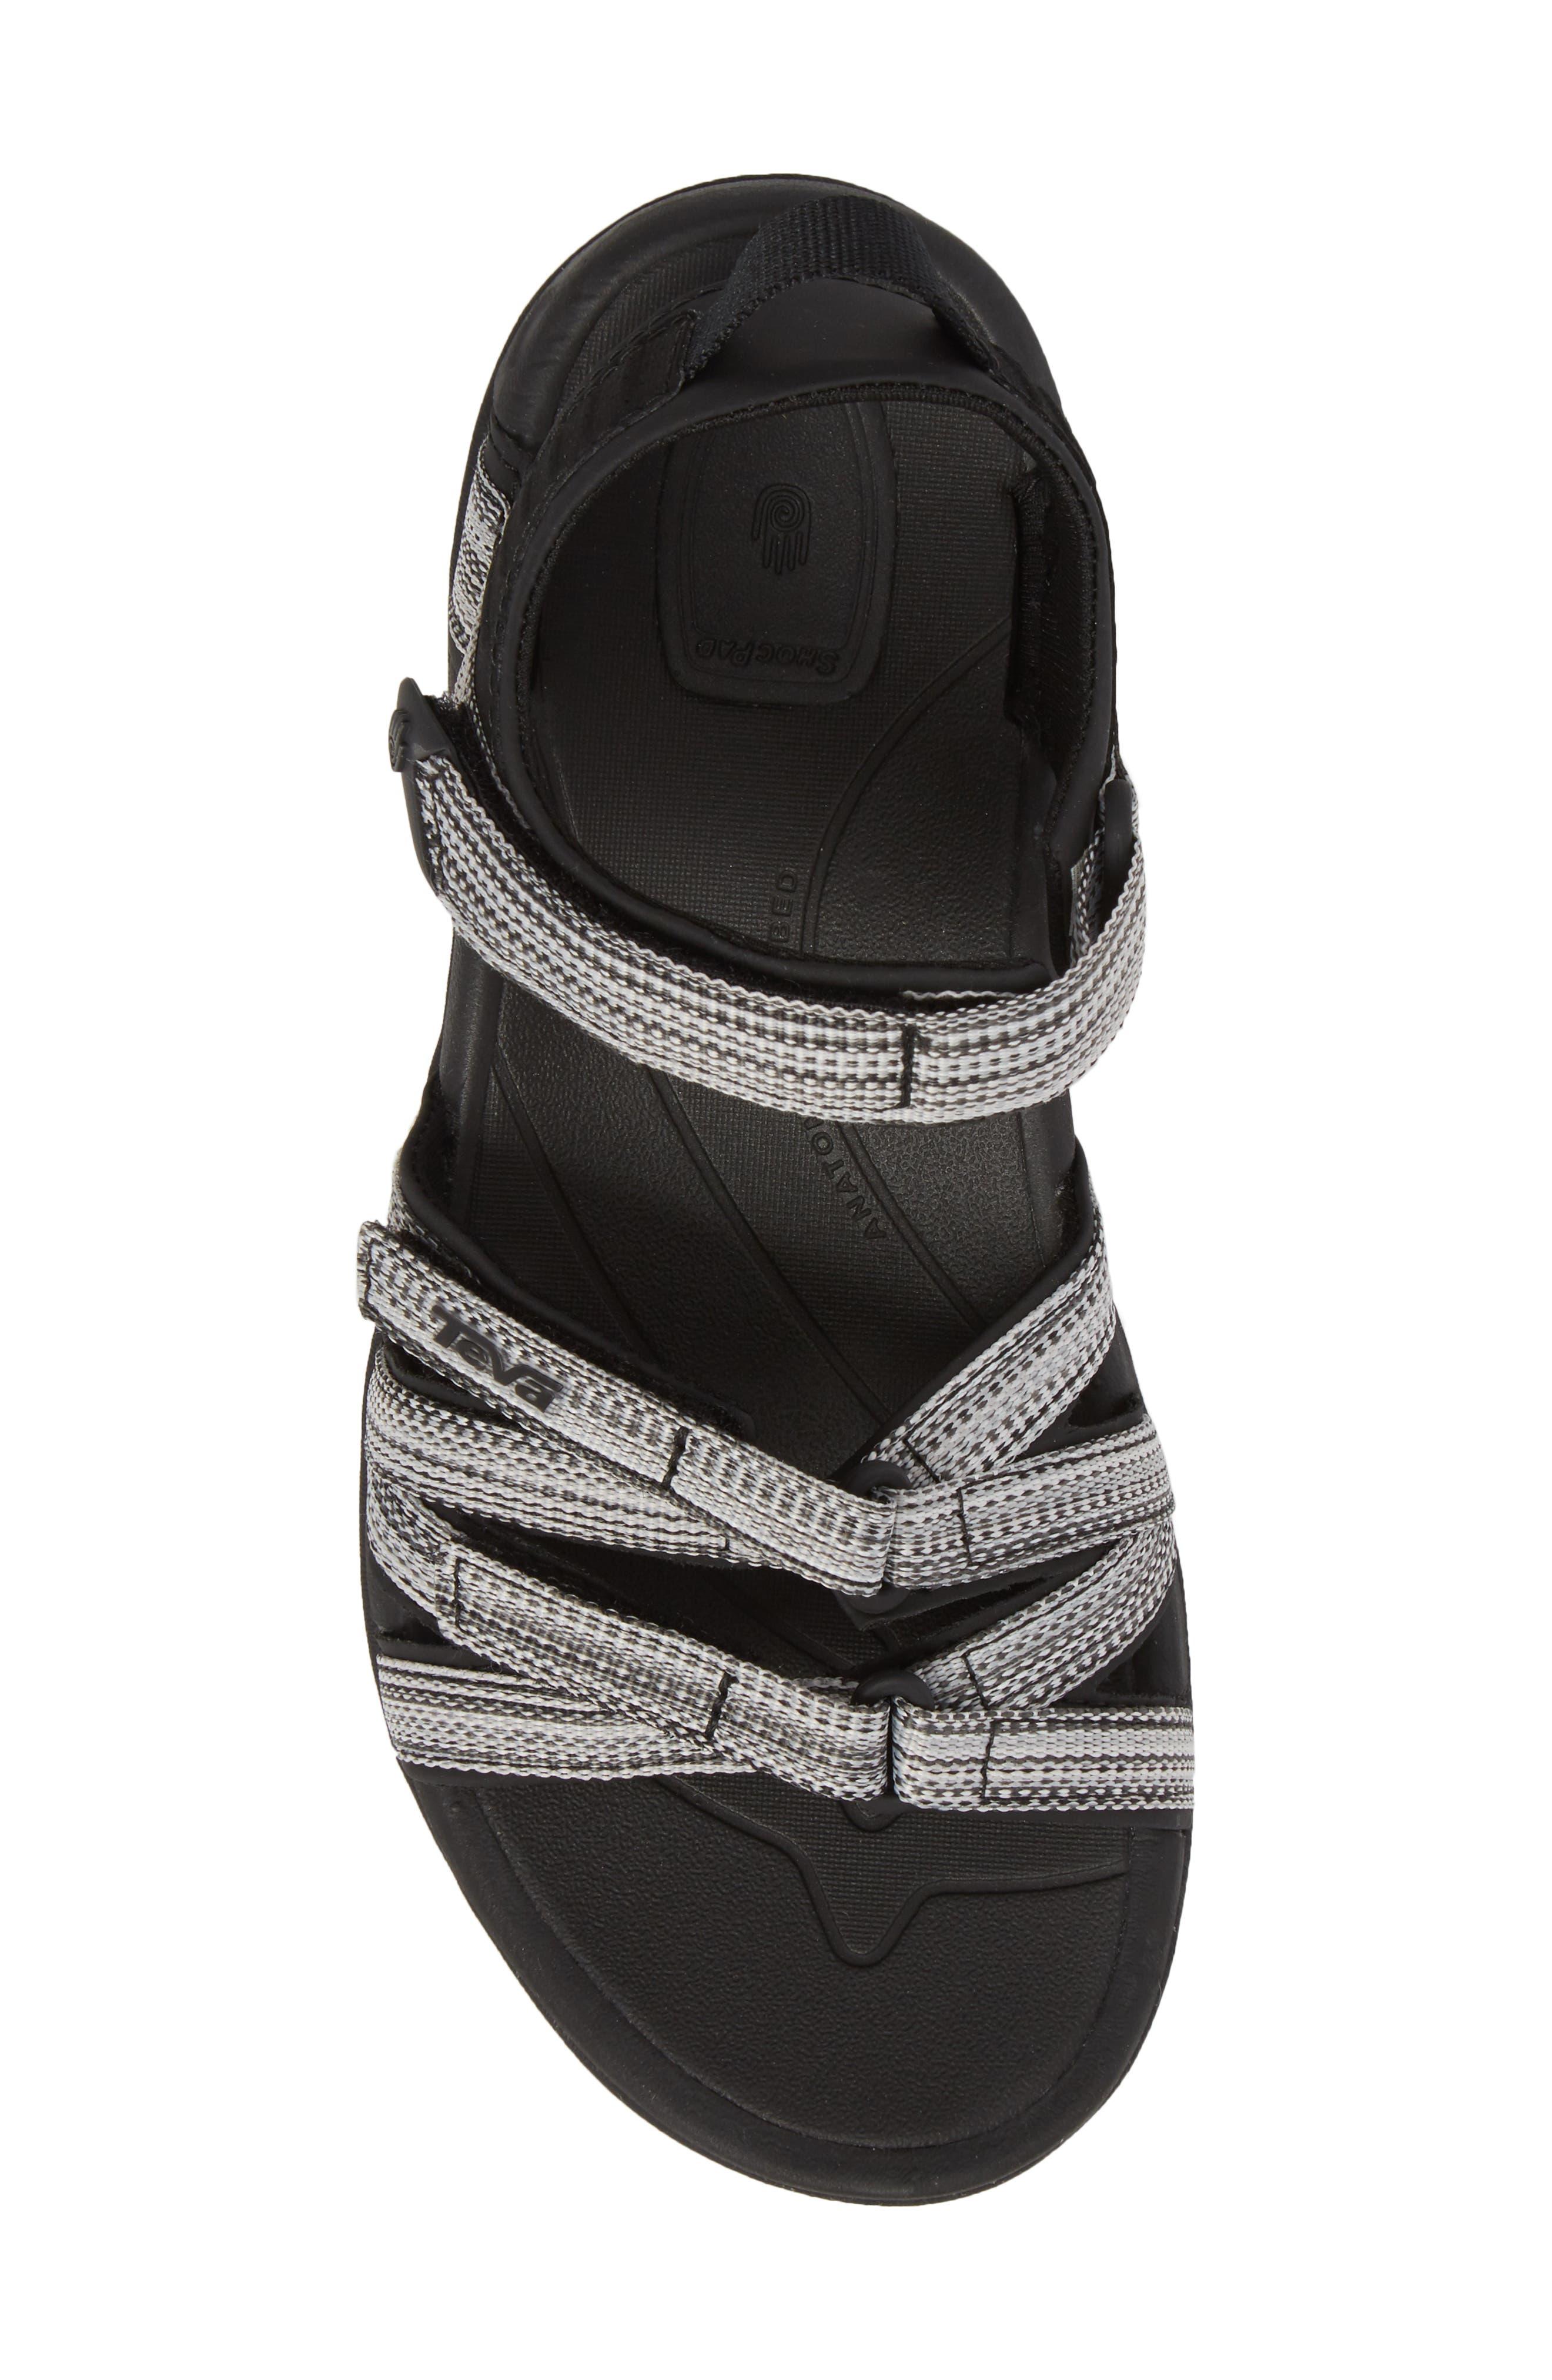 'Tirra' Sandal,                             Alternate thumbnail 5, color,                             Black/ White Multi Fabric